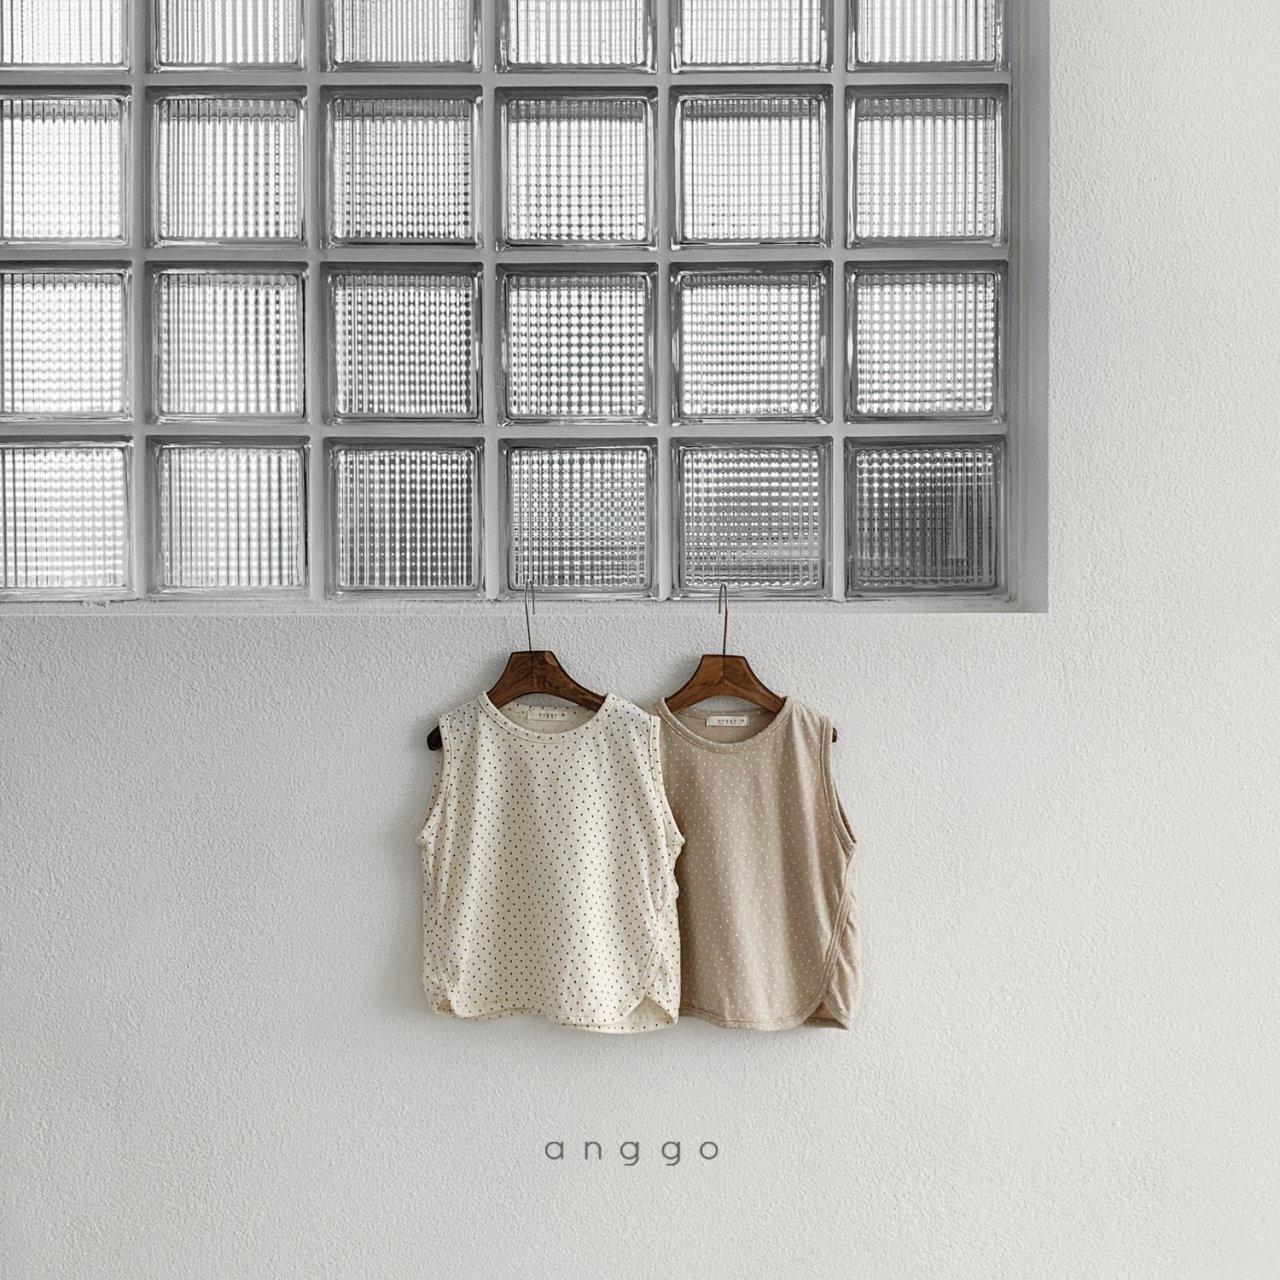 NO.1376   sesame tee / anggo